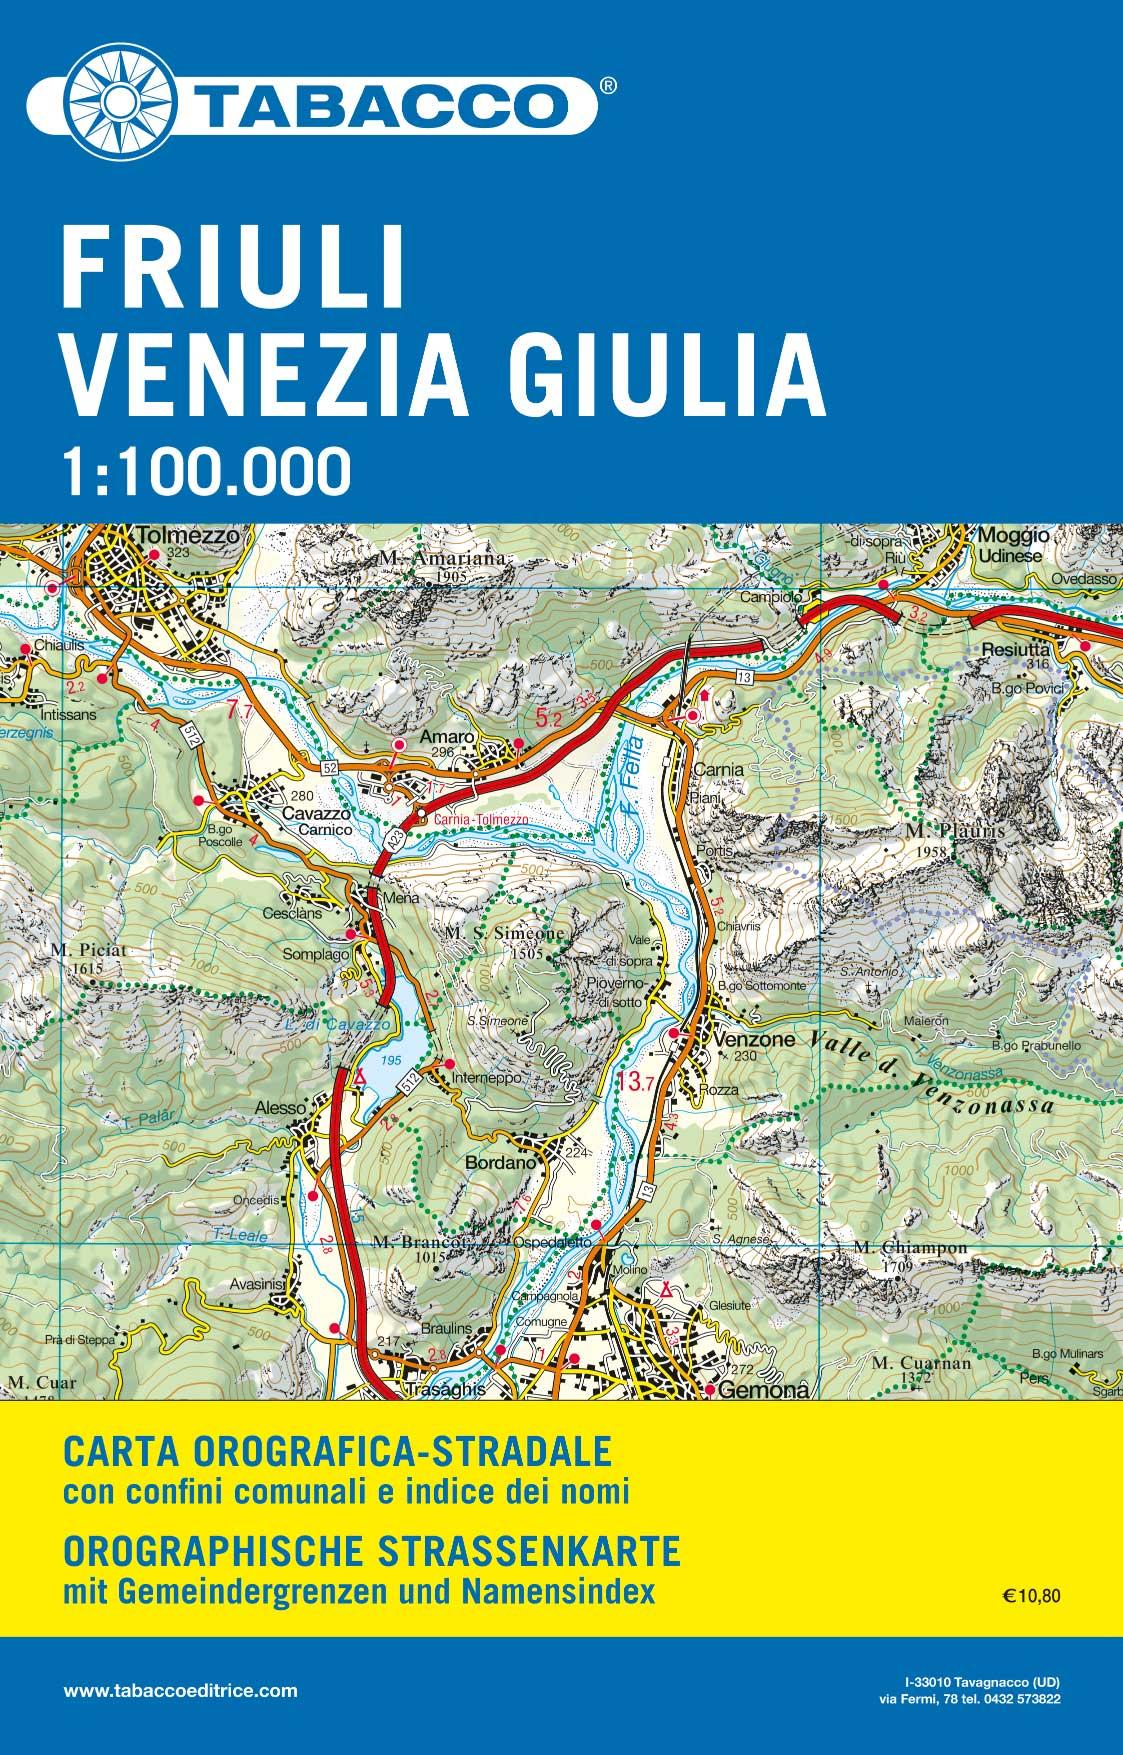 Cartina Friuli Venezia Giulia.Friuli Venezia Giulia Vf100 Tabacco Editrice